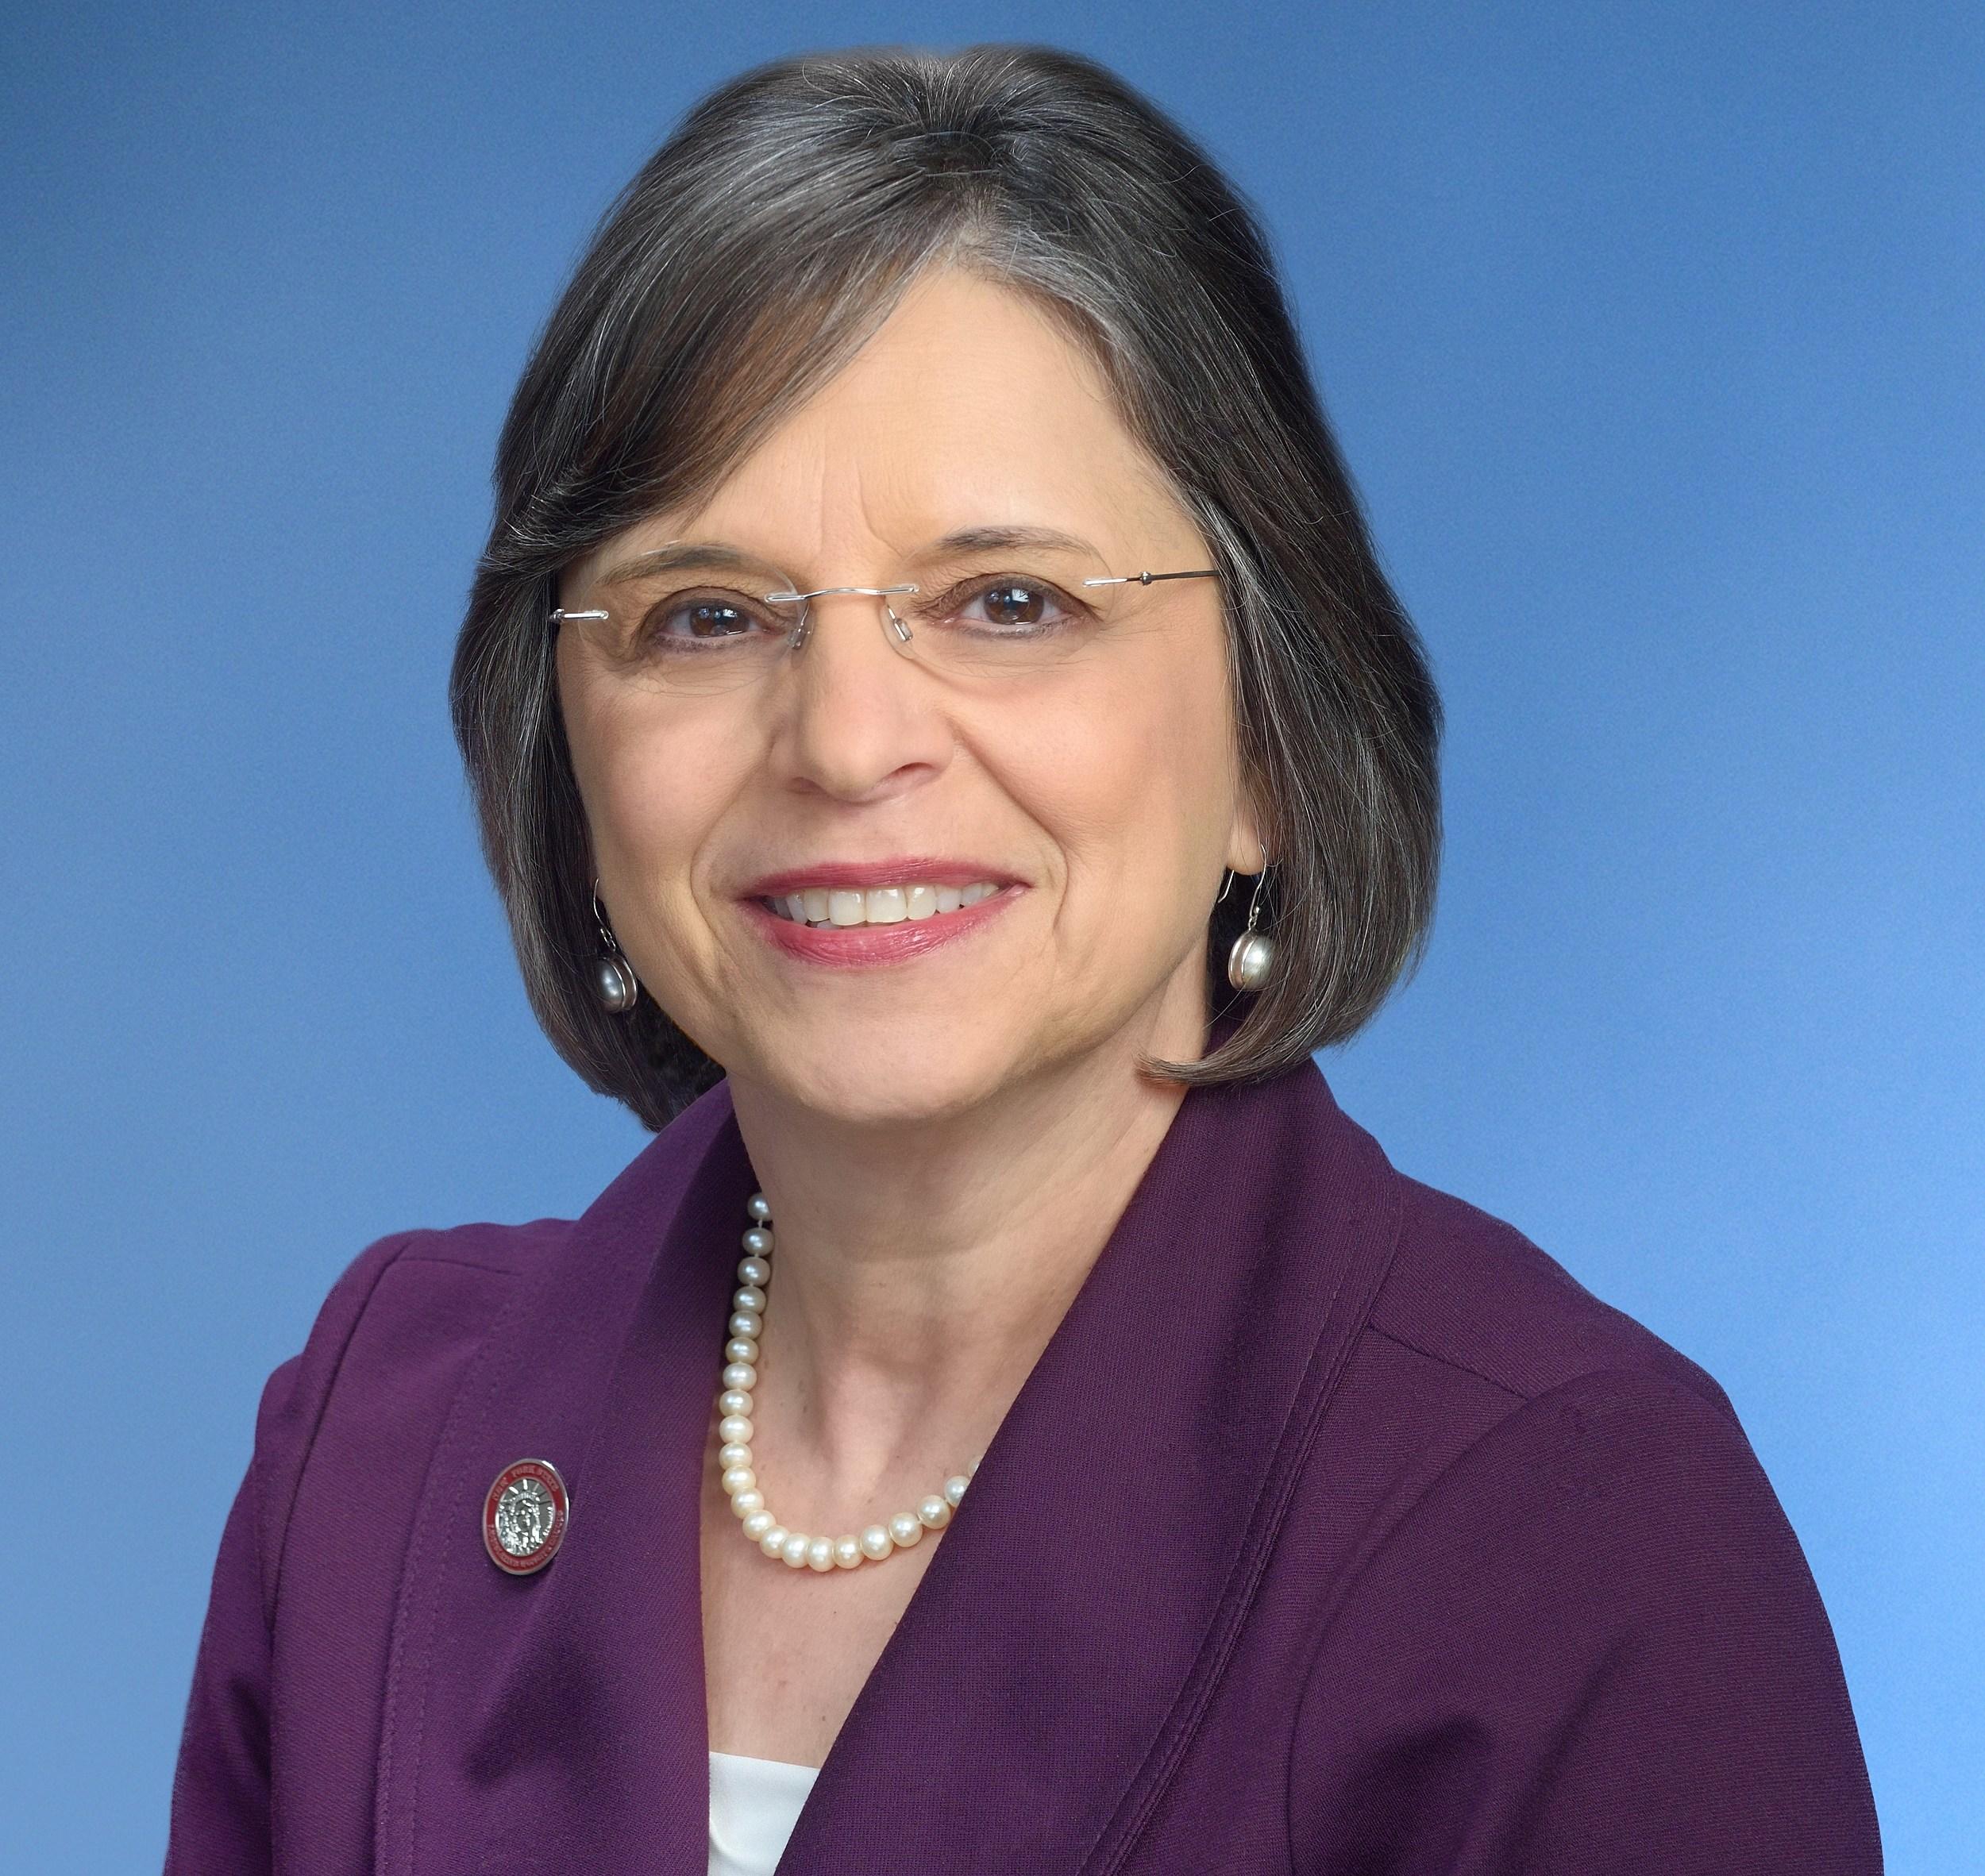 Assemblywoman Donna Lupardo